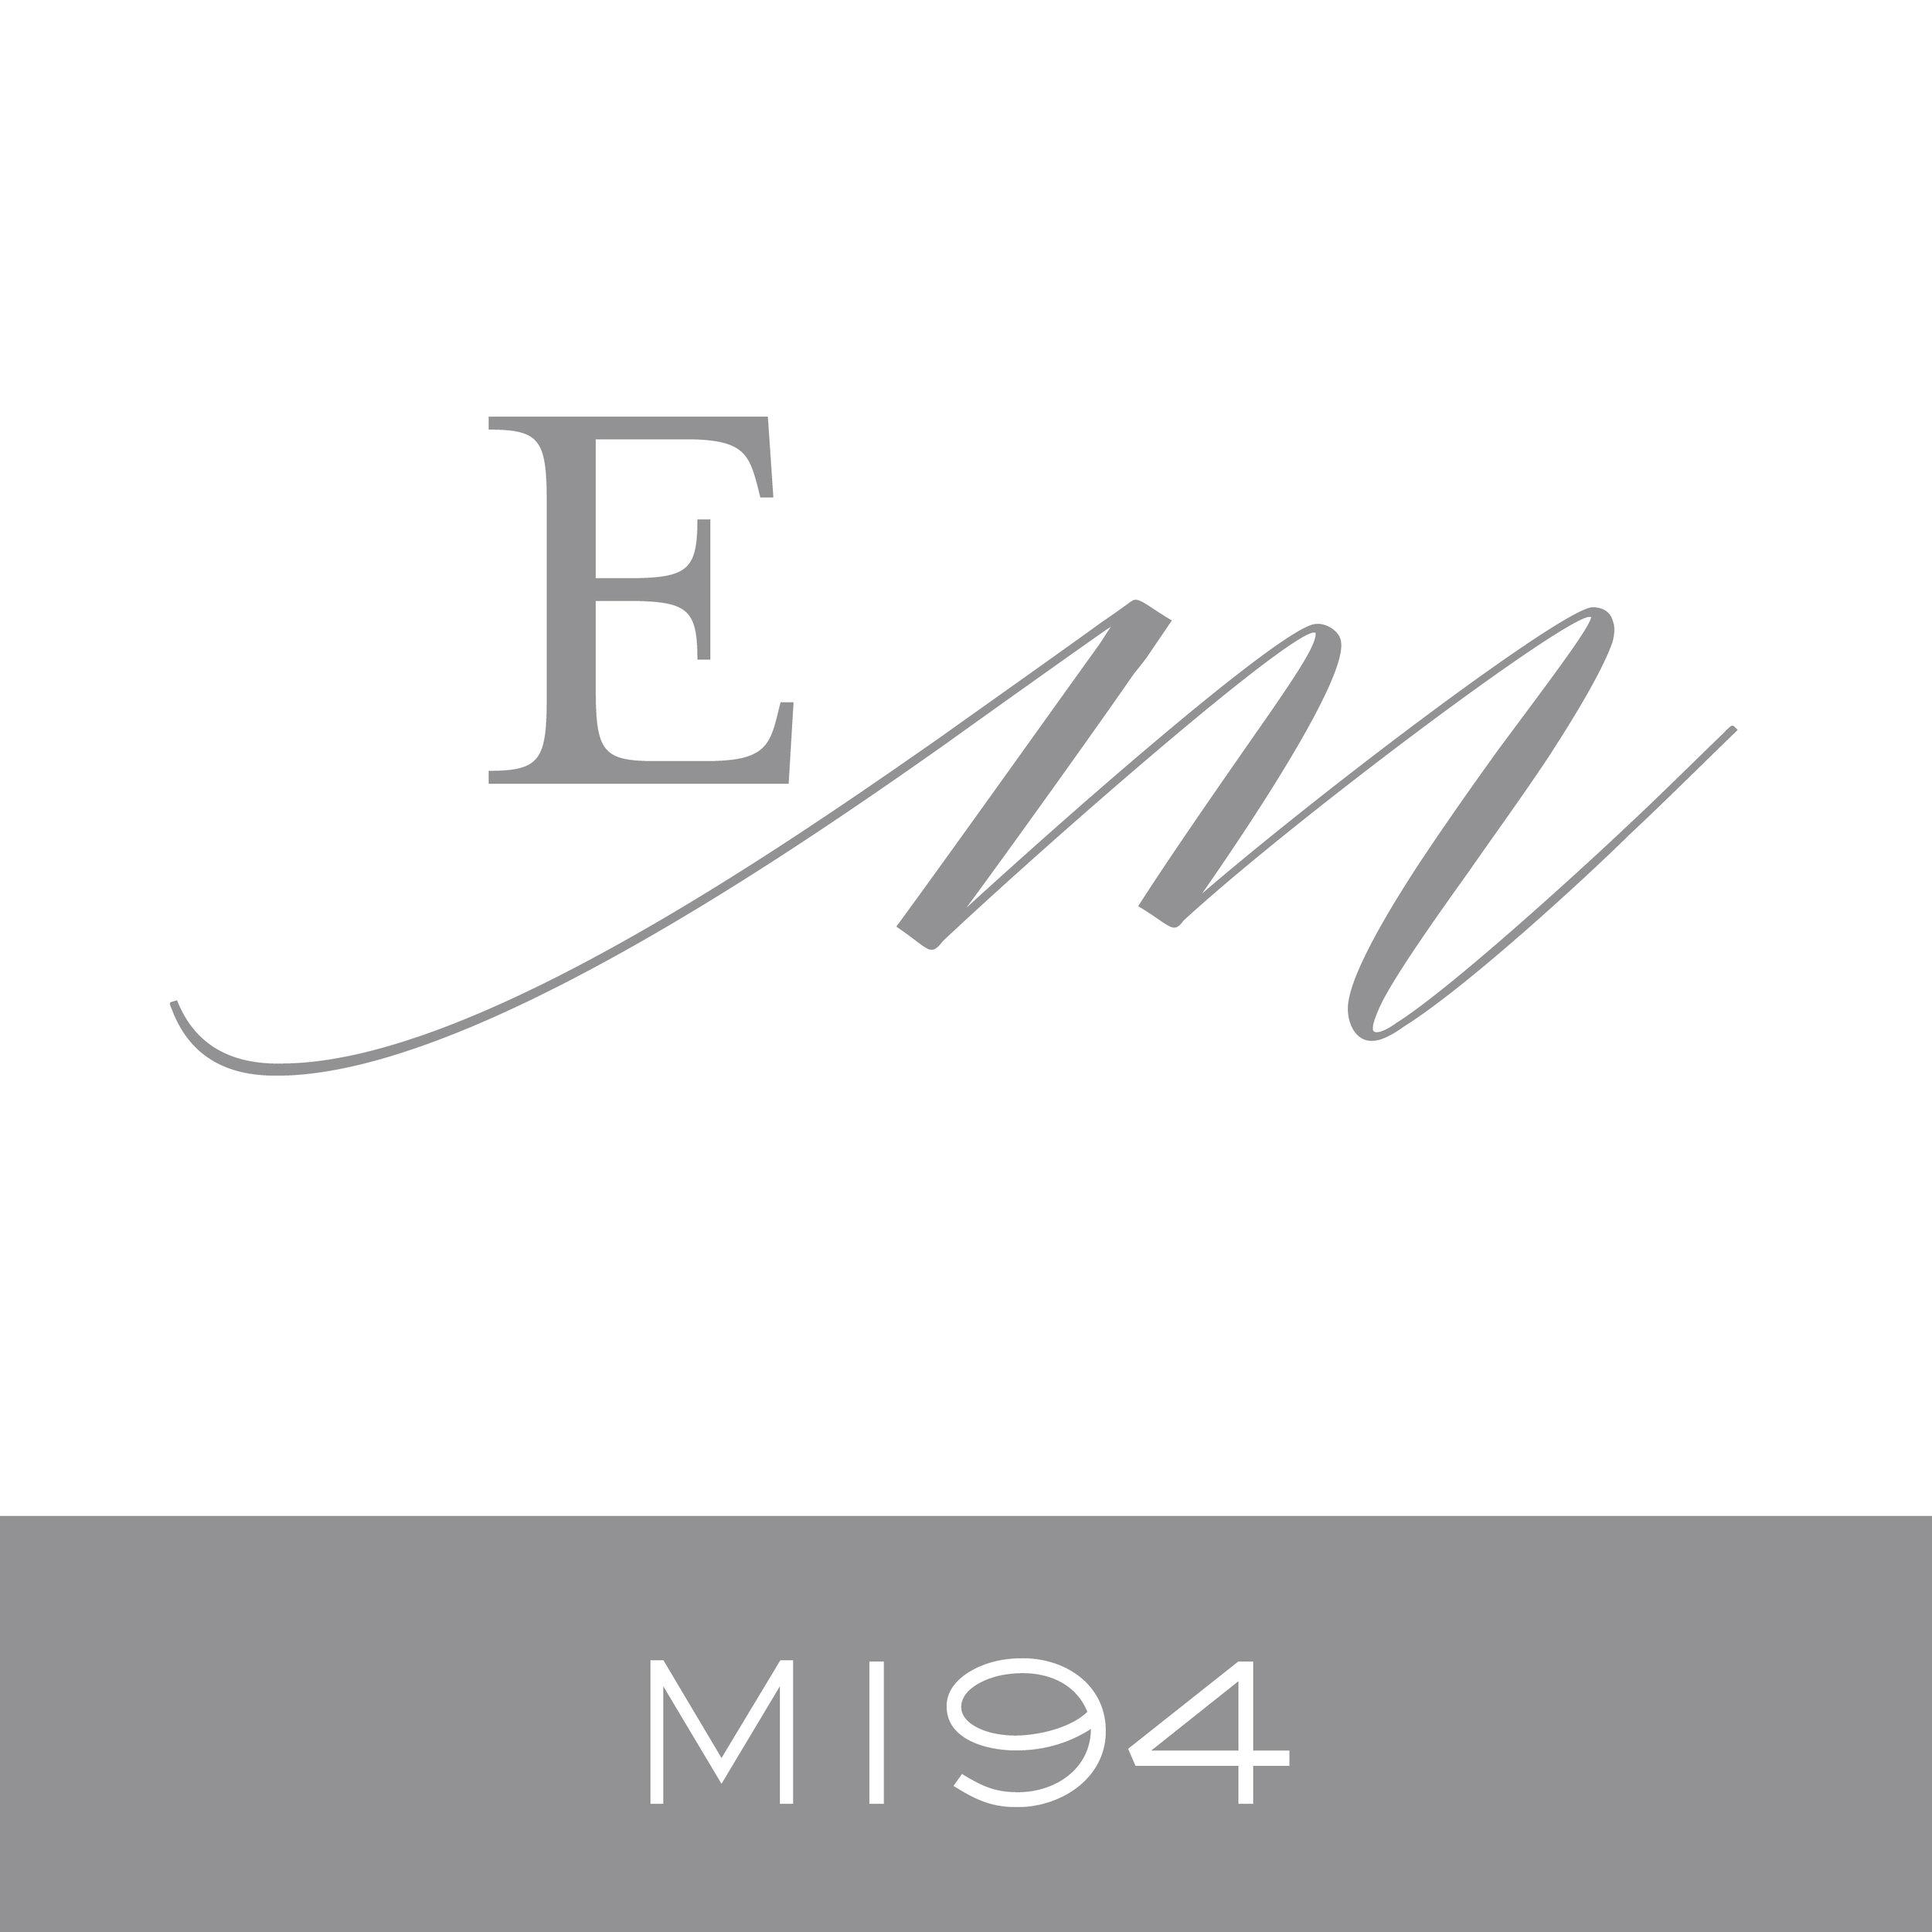 M194.jpg